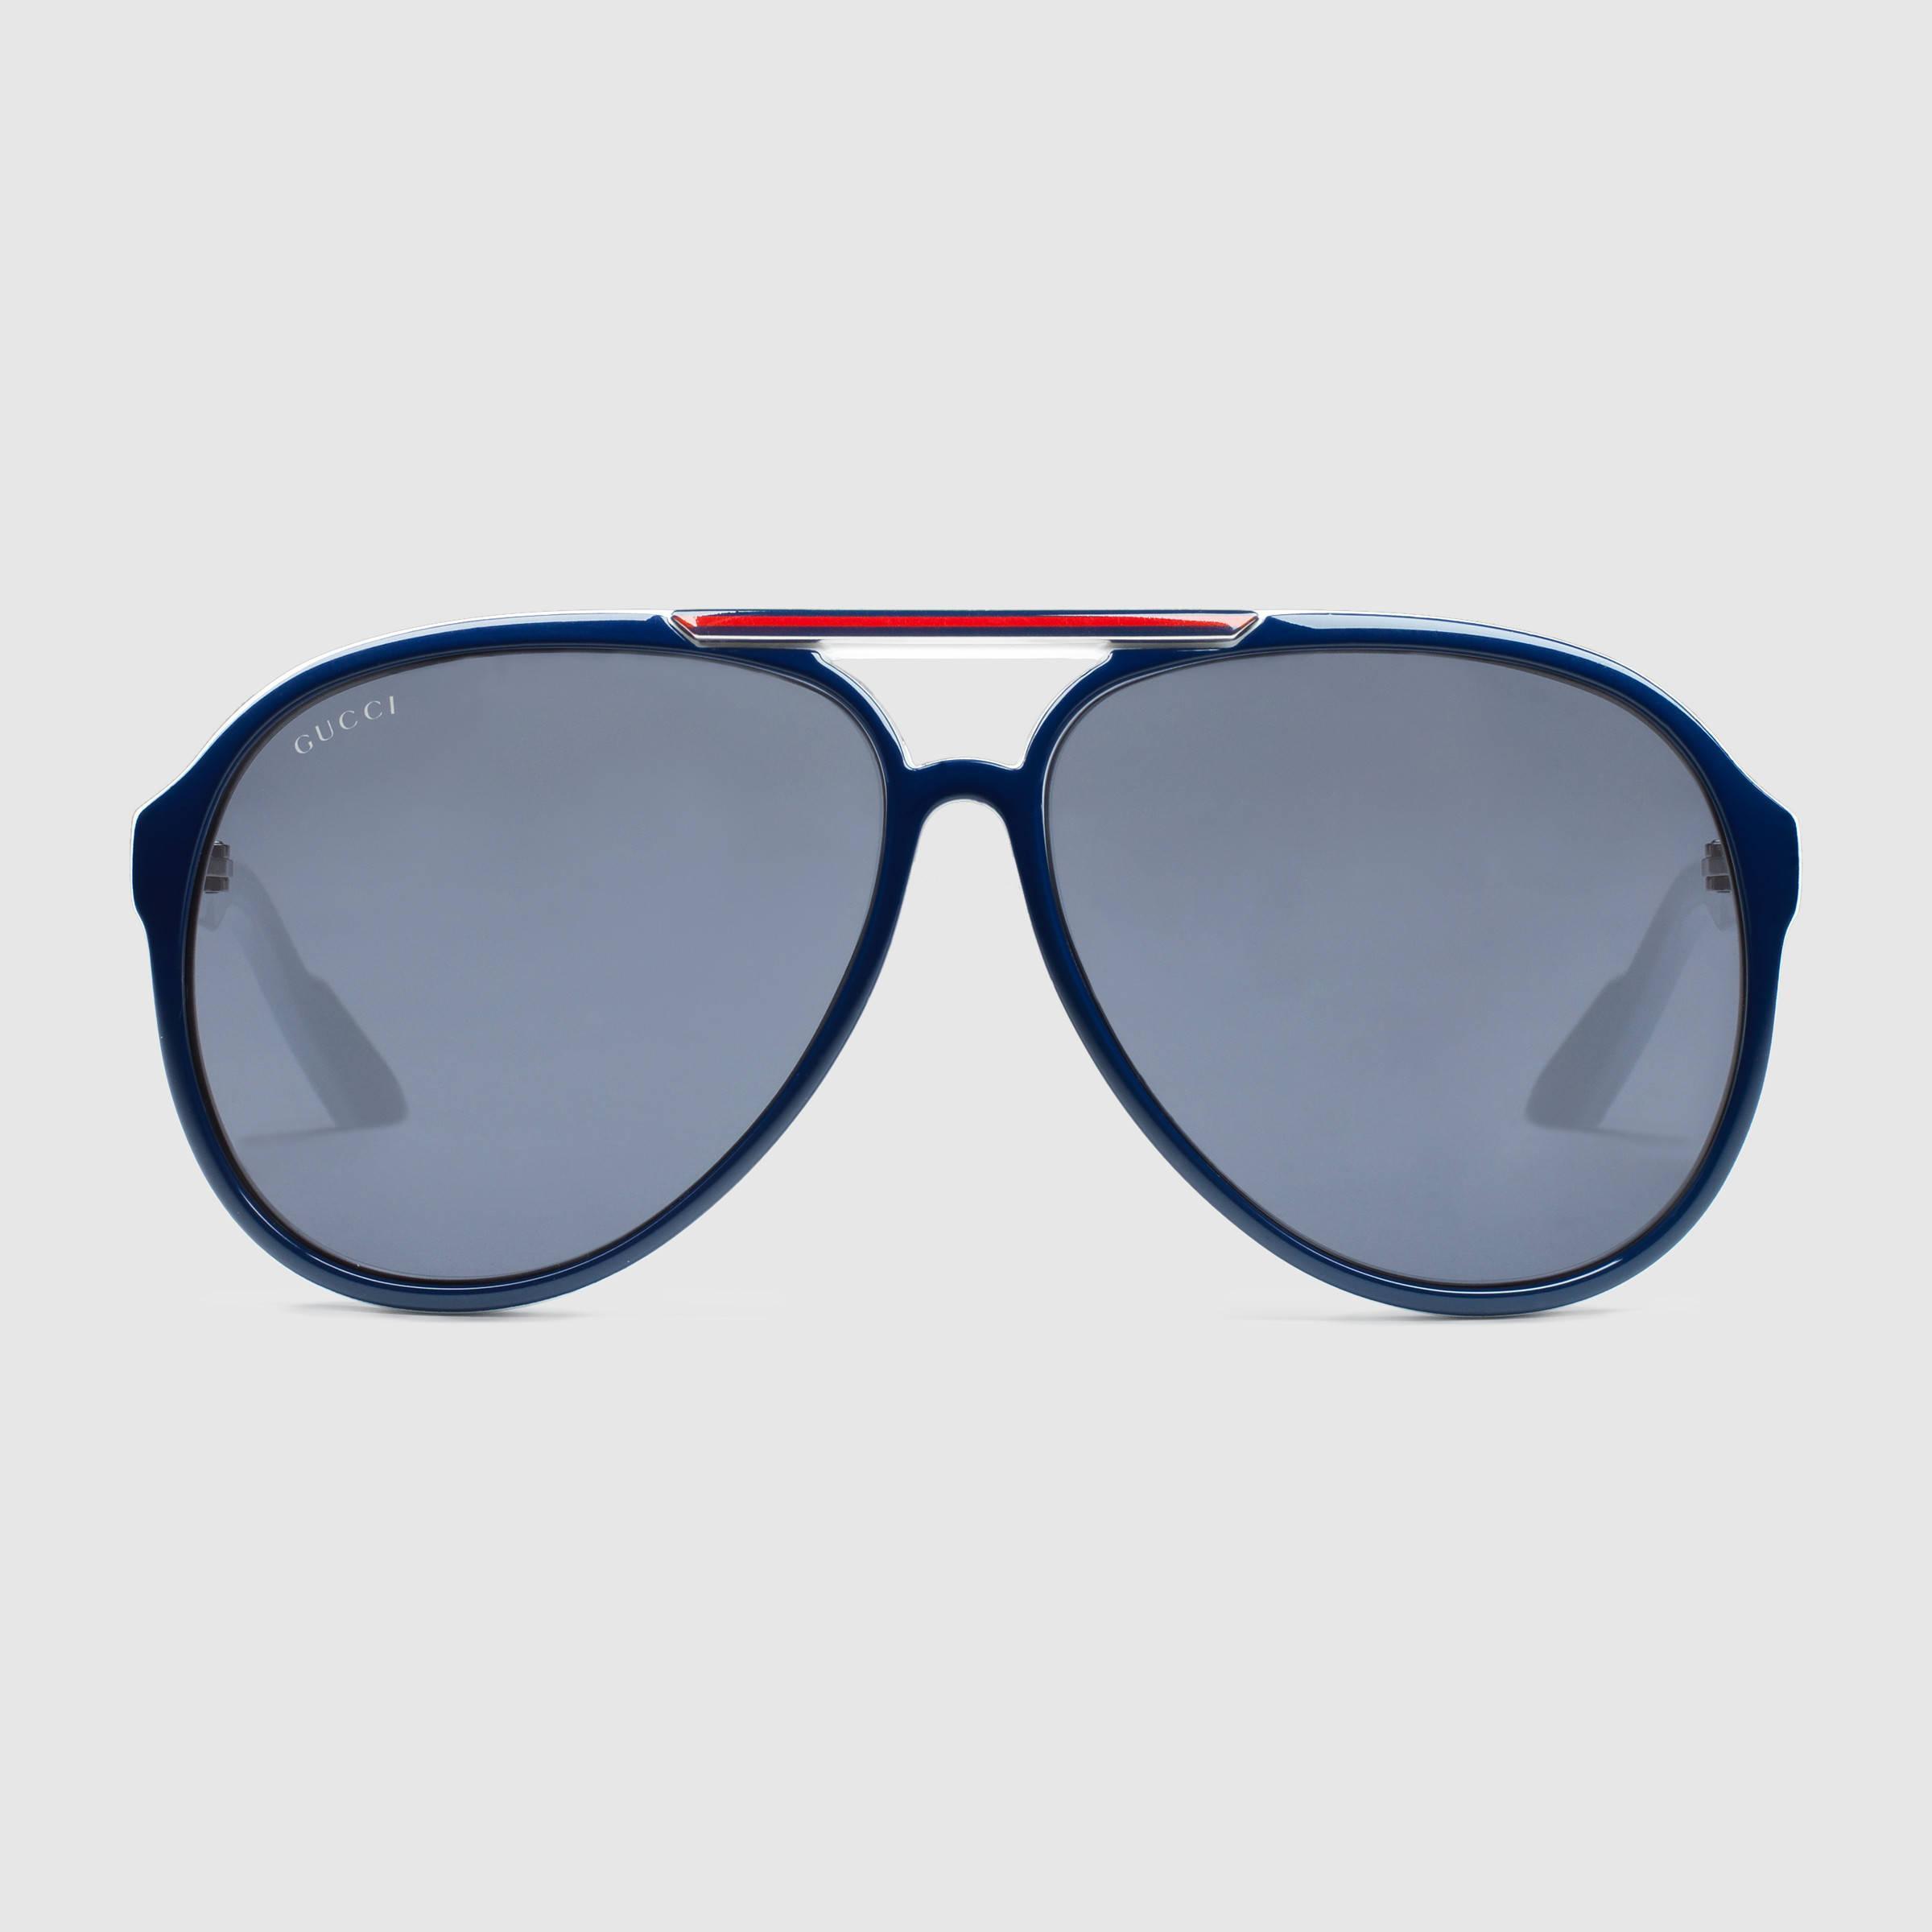 6e8cd060f891 Gucci Medium Aviator Sunglasses in Blue for Men - Lyst